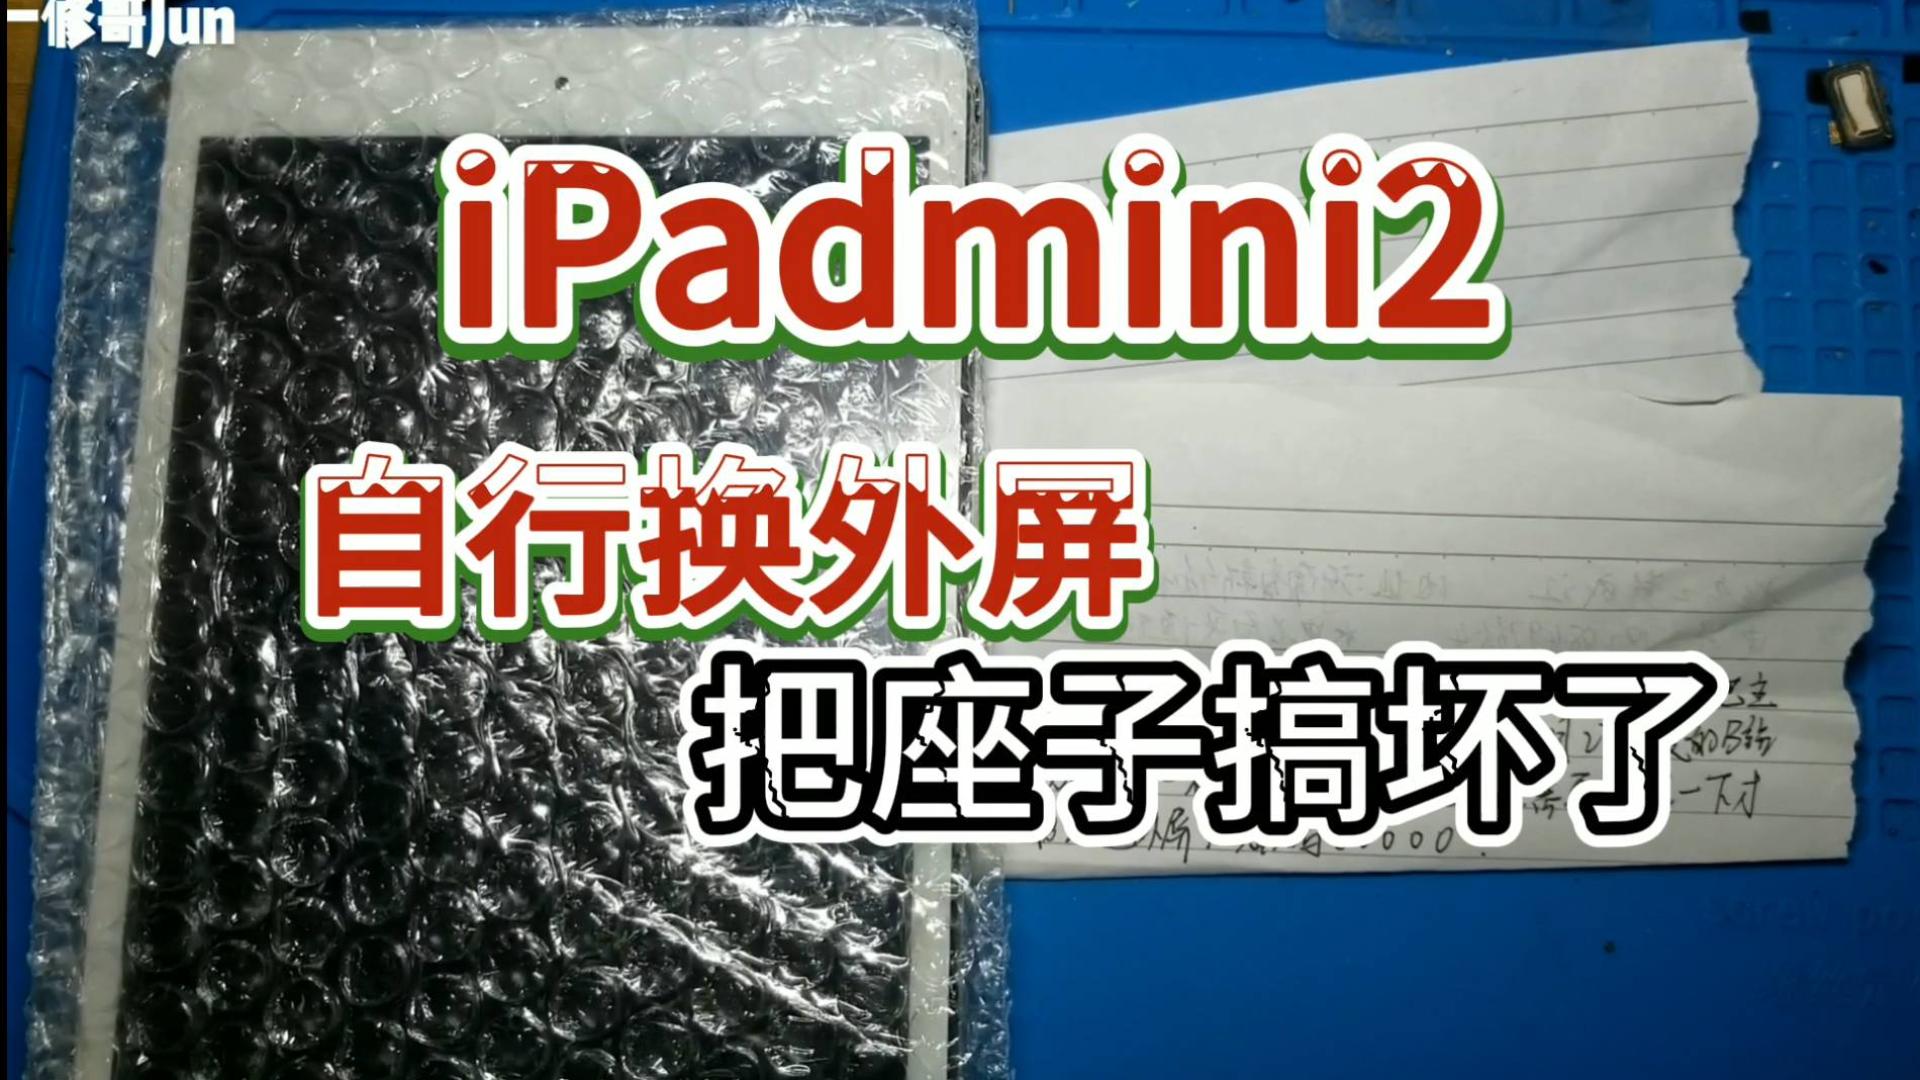 iPadmini2客人自己换触摸屏,内联座扣坏,一修哥显微镜下更换!